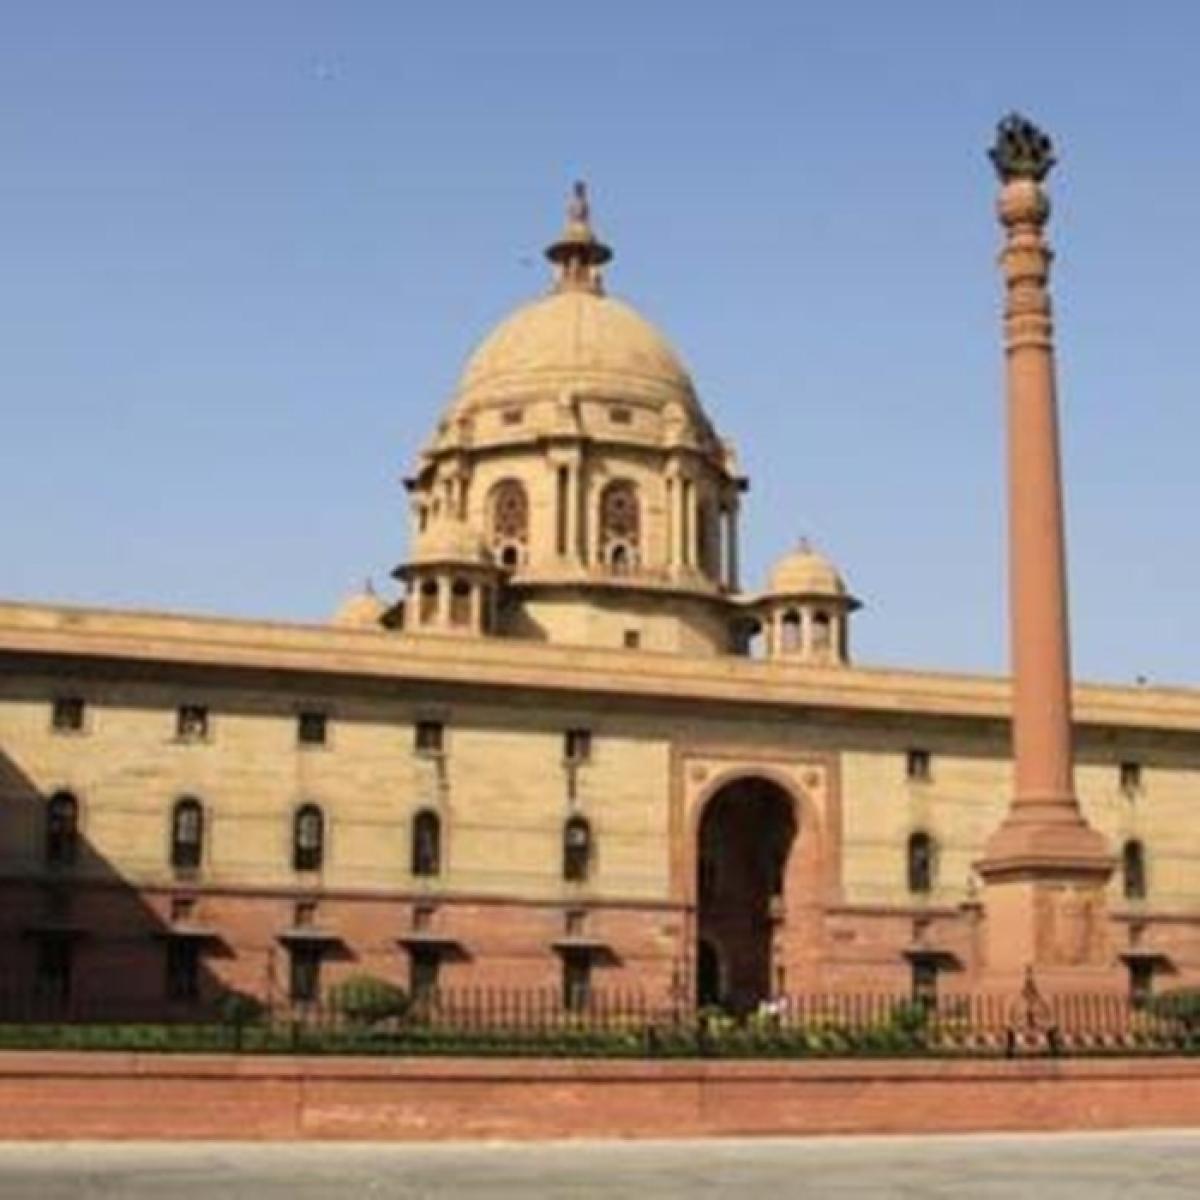 Centre compulsorily retires 15 senior CBIC officials for misconduct